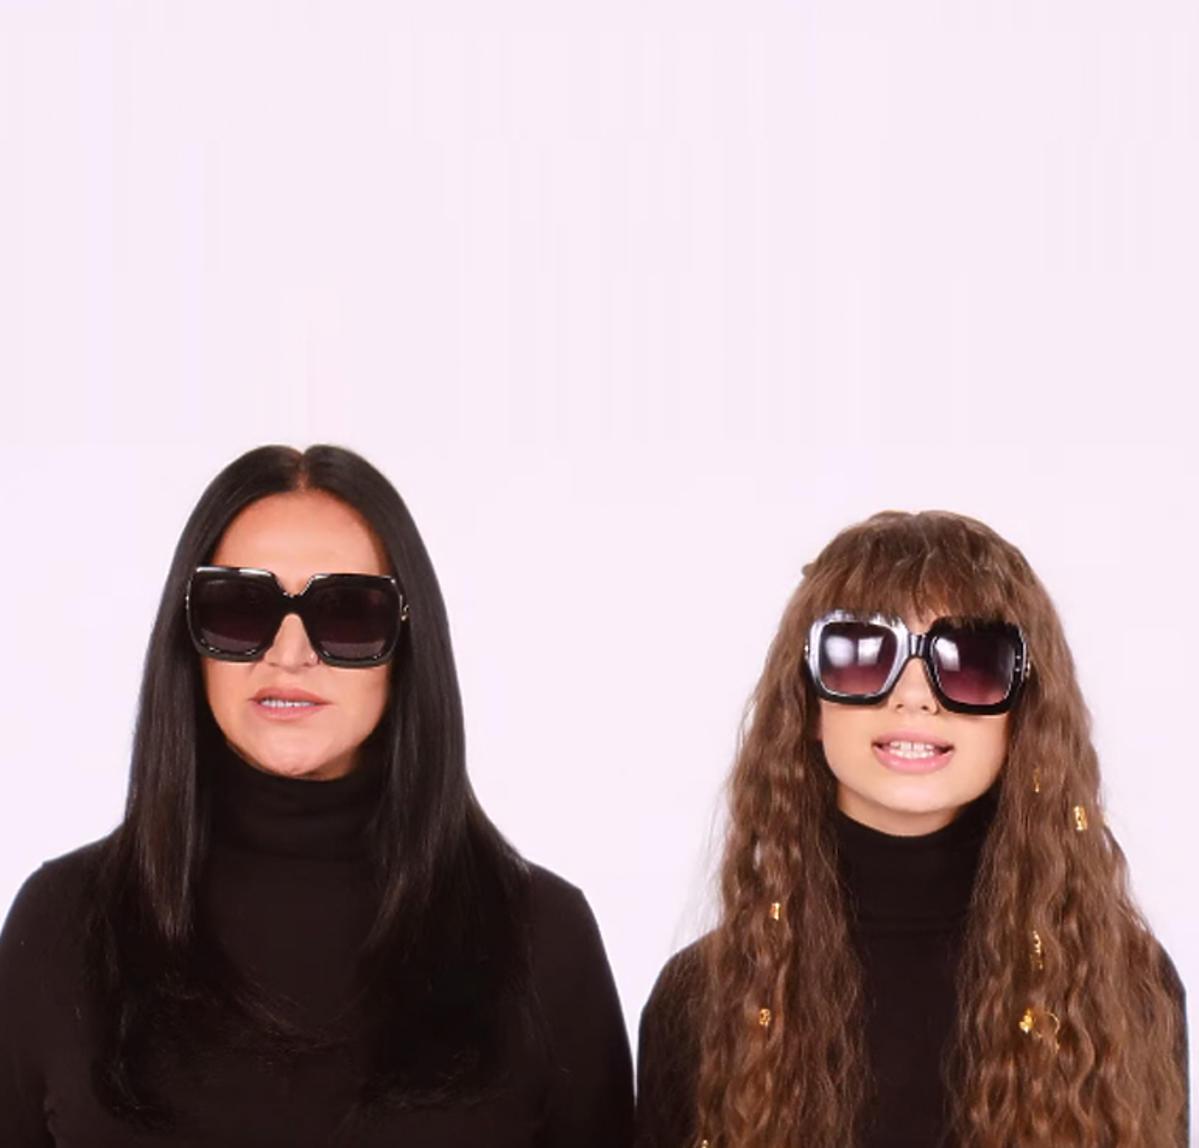 Viki Gabor i Kayah nagrały wspólną piosenkę